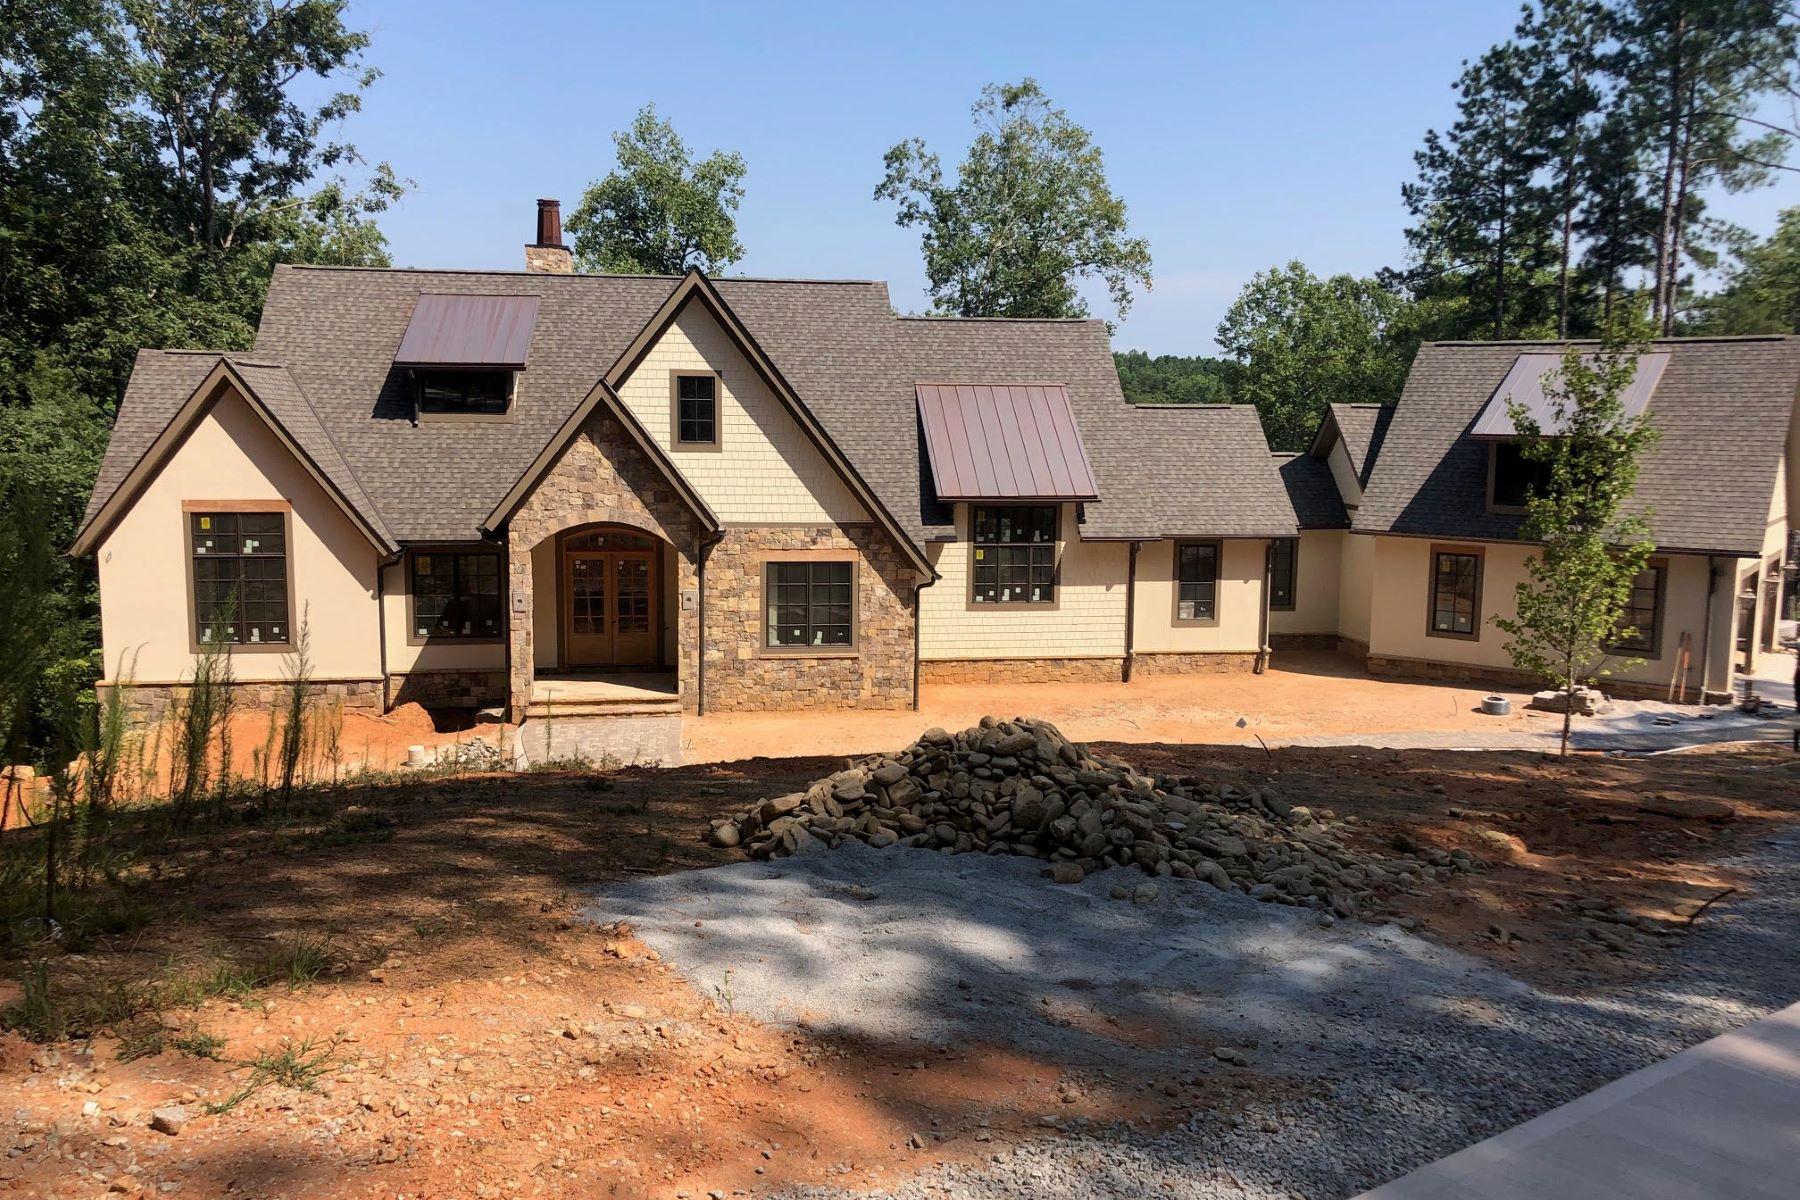 Single Family Homes for Active at Beautiful Long Views 159 Lake Breeze Trail Six Mile, South Carolina 29682 United States